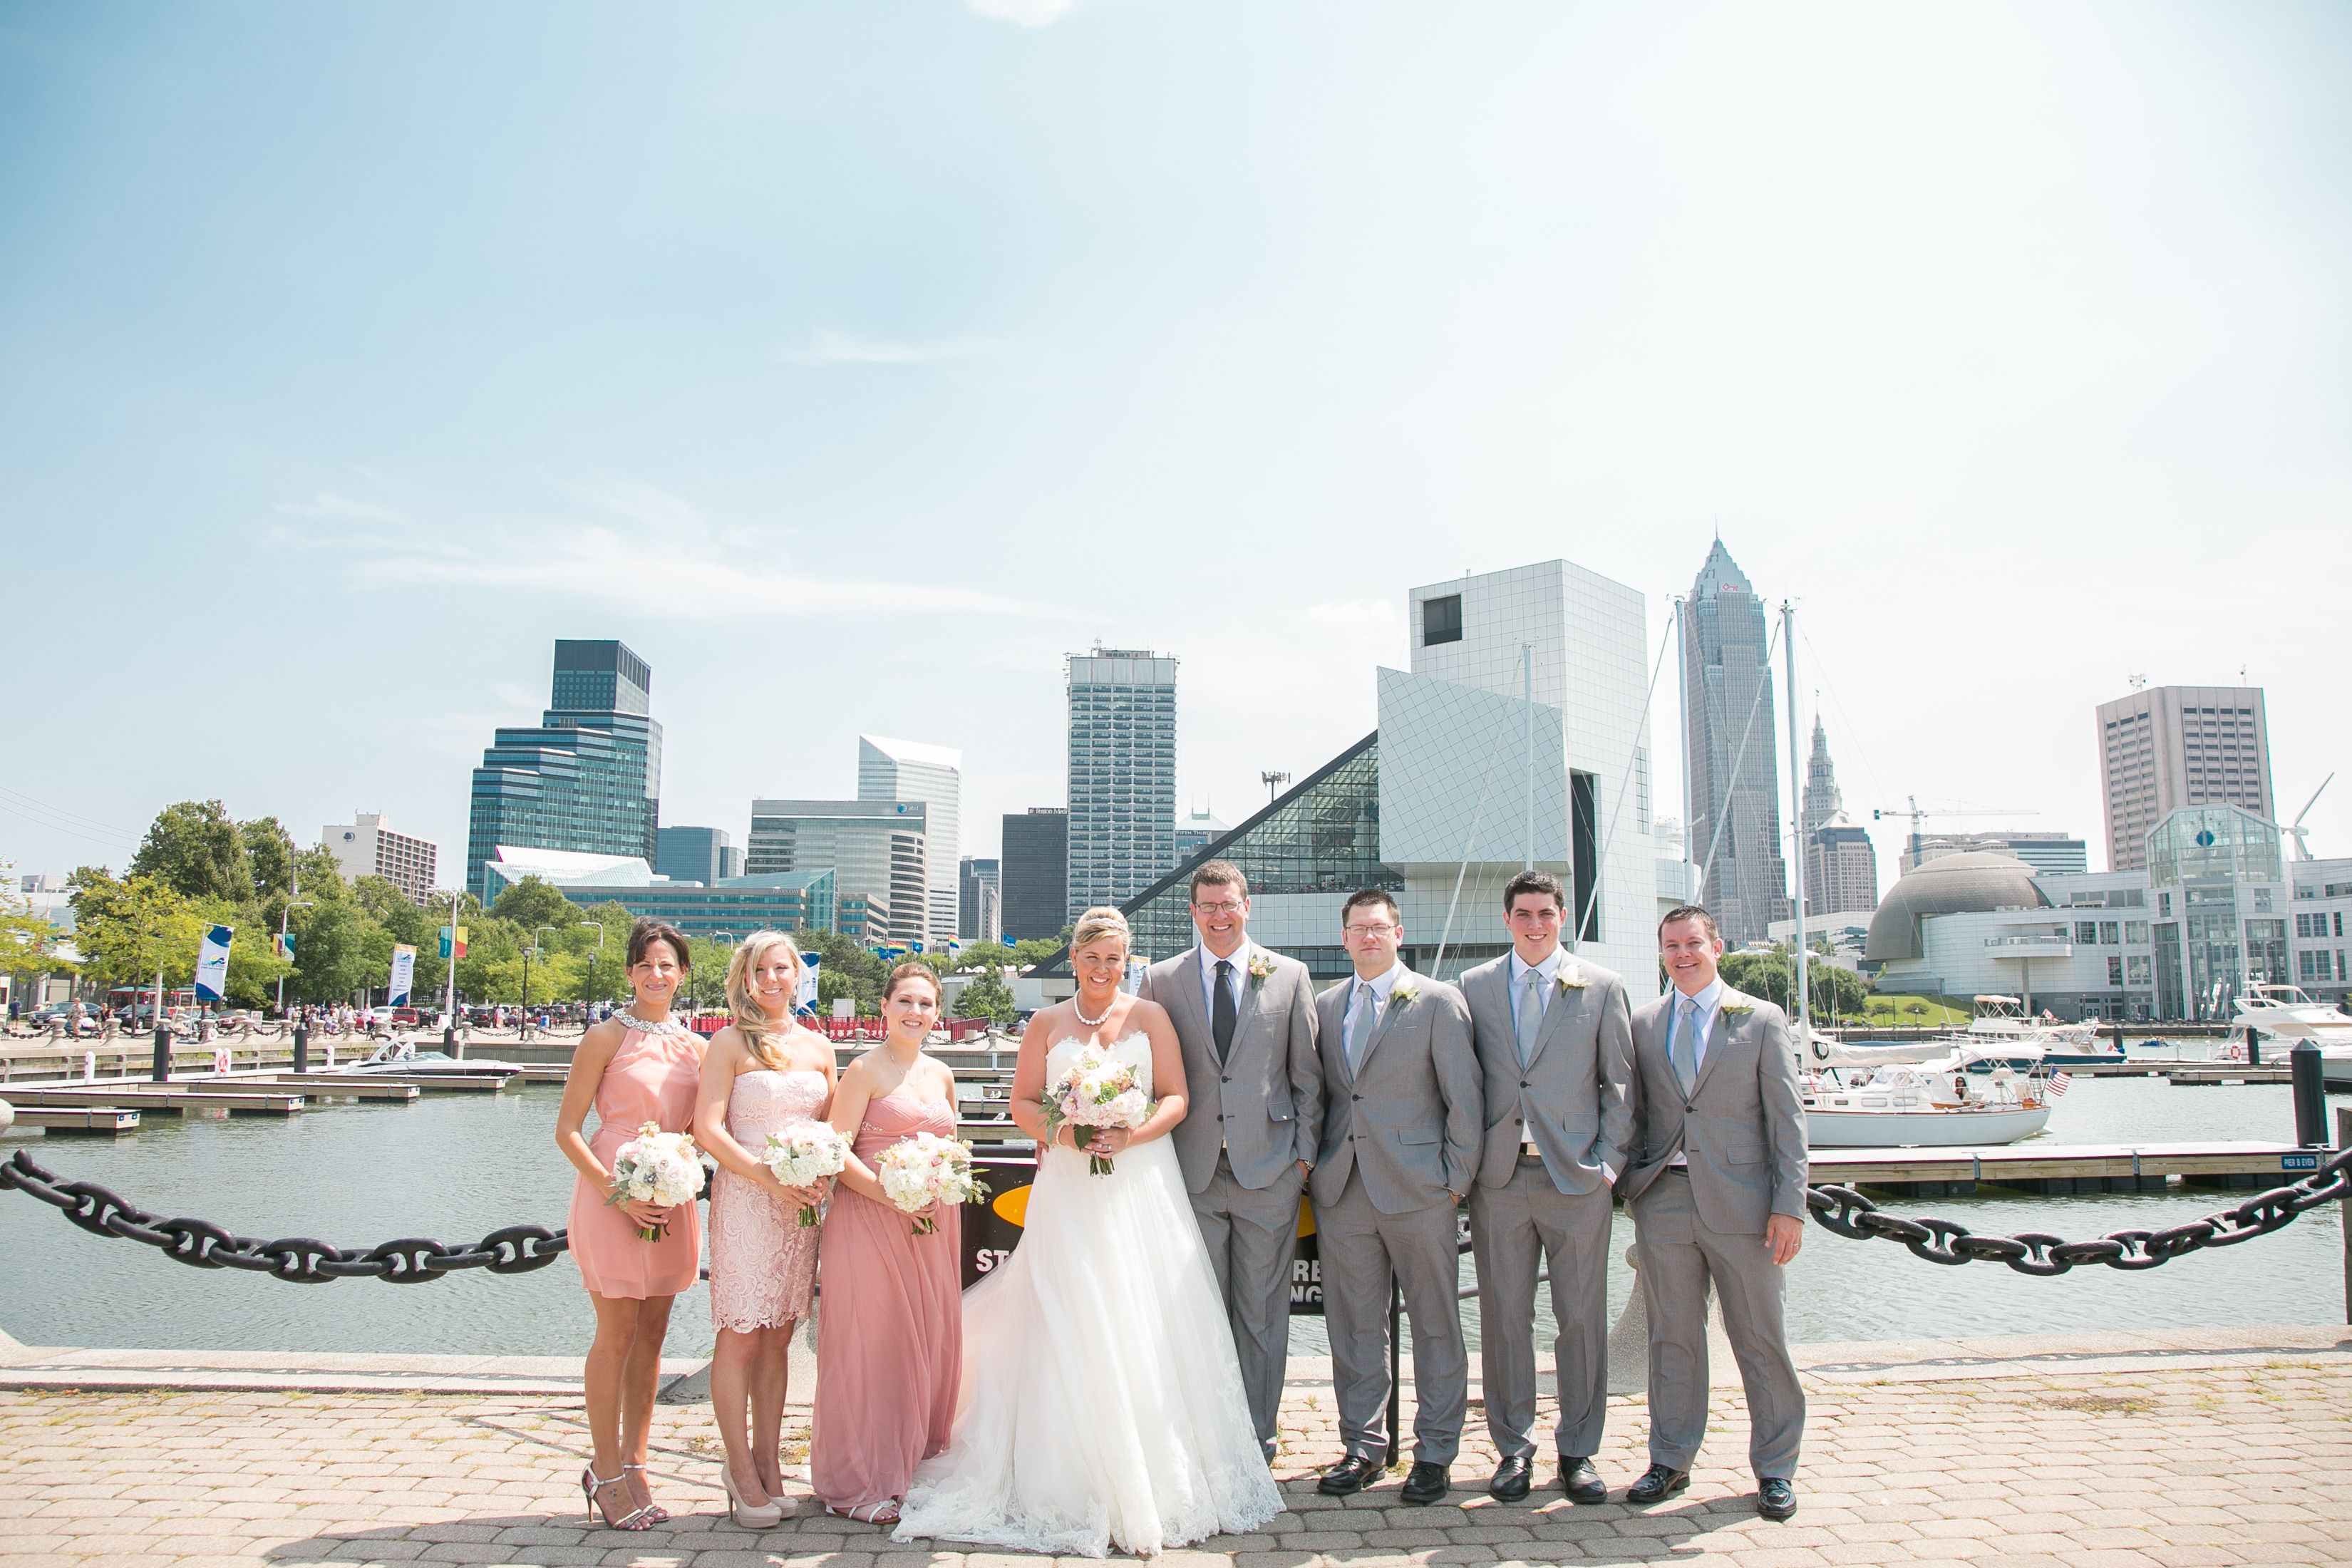 Voinovich Park Cleveland Ohio Wedding Cleveland Wedding Photo Locations Cleveland Wedding Ohio Wedding Country Chic Wedding